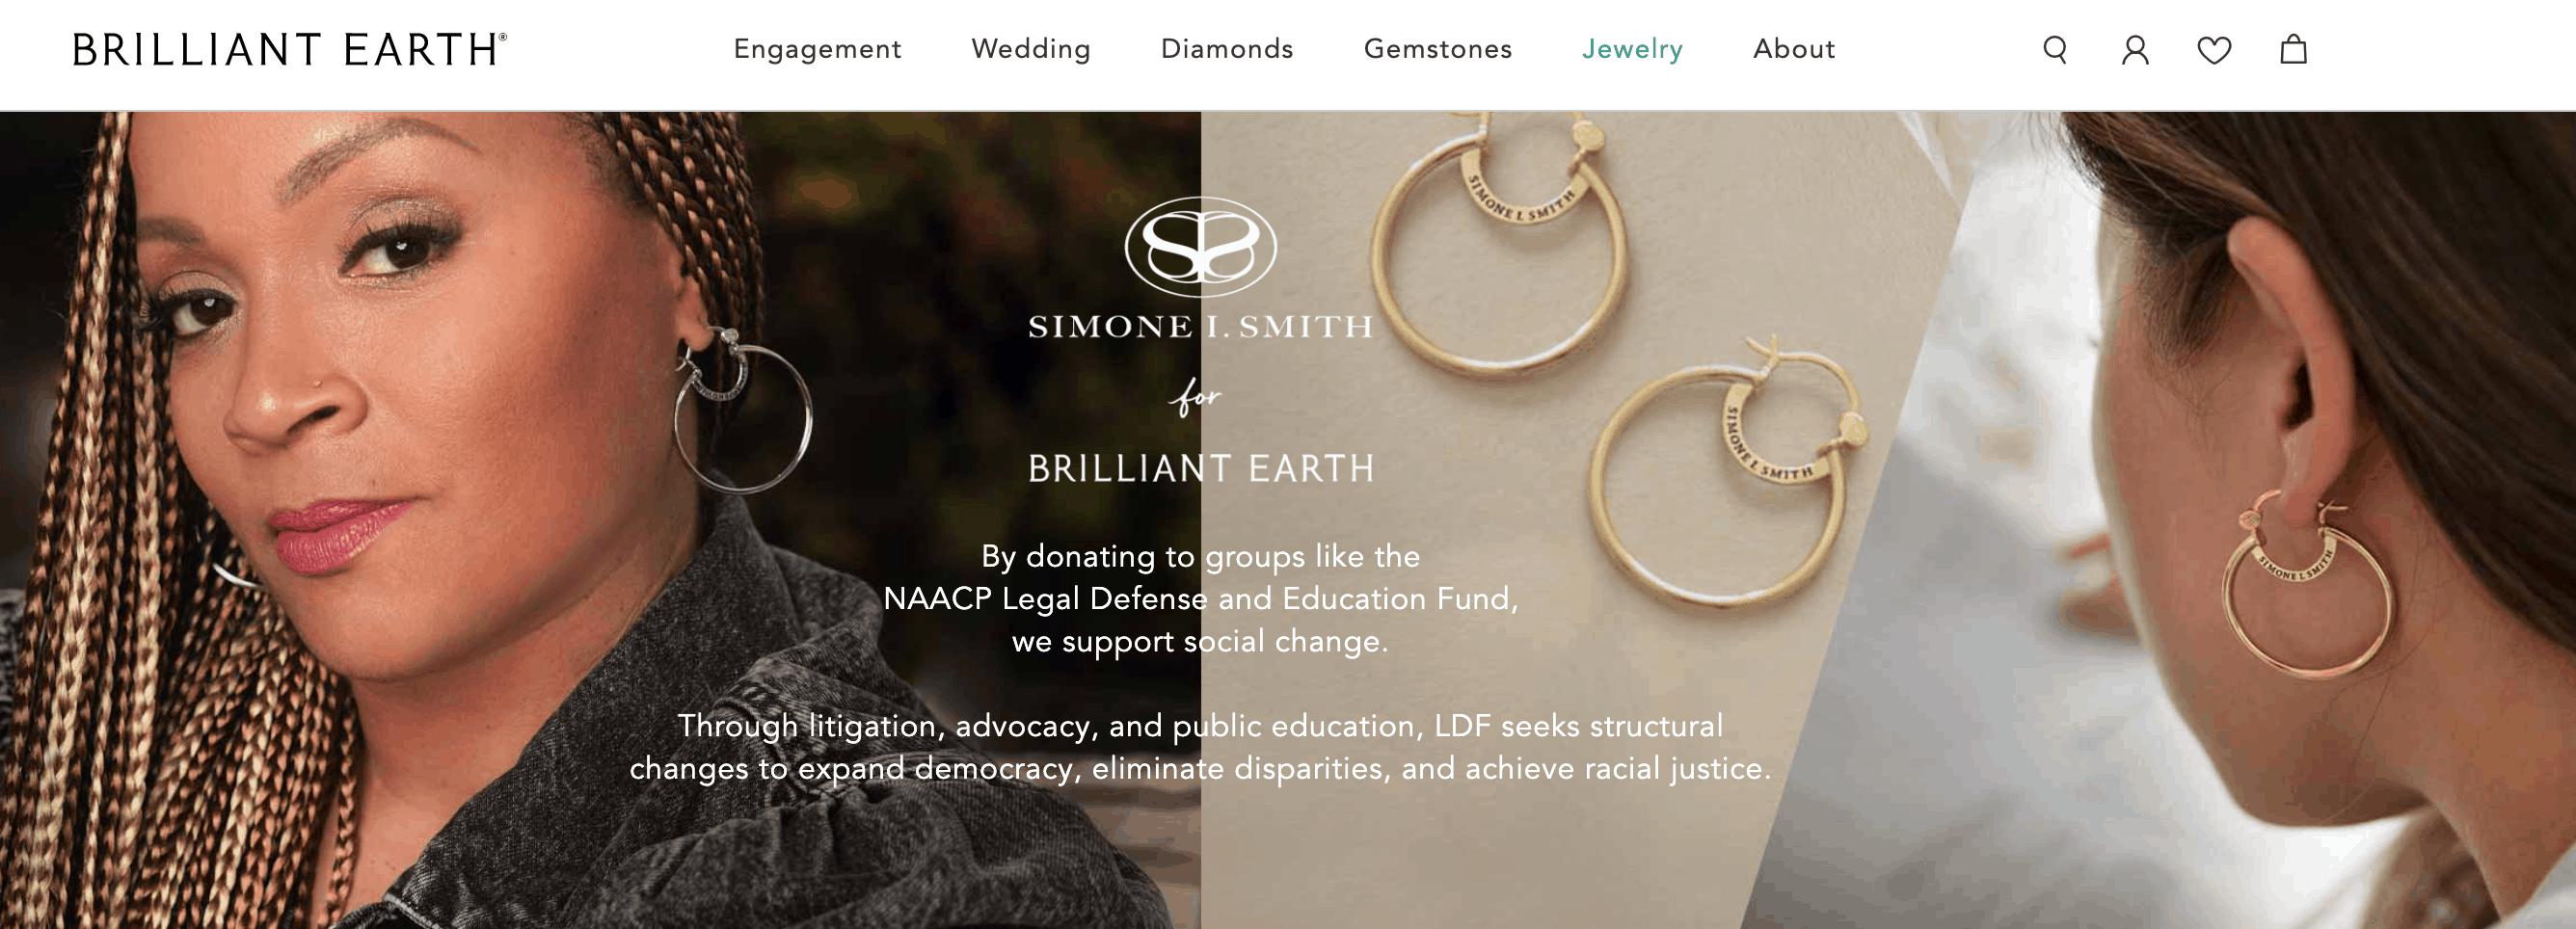 brilliant earth simone smith collection